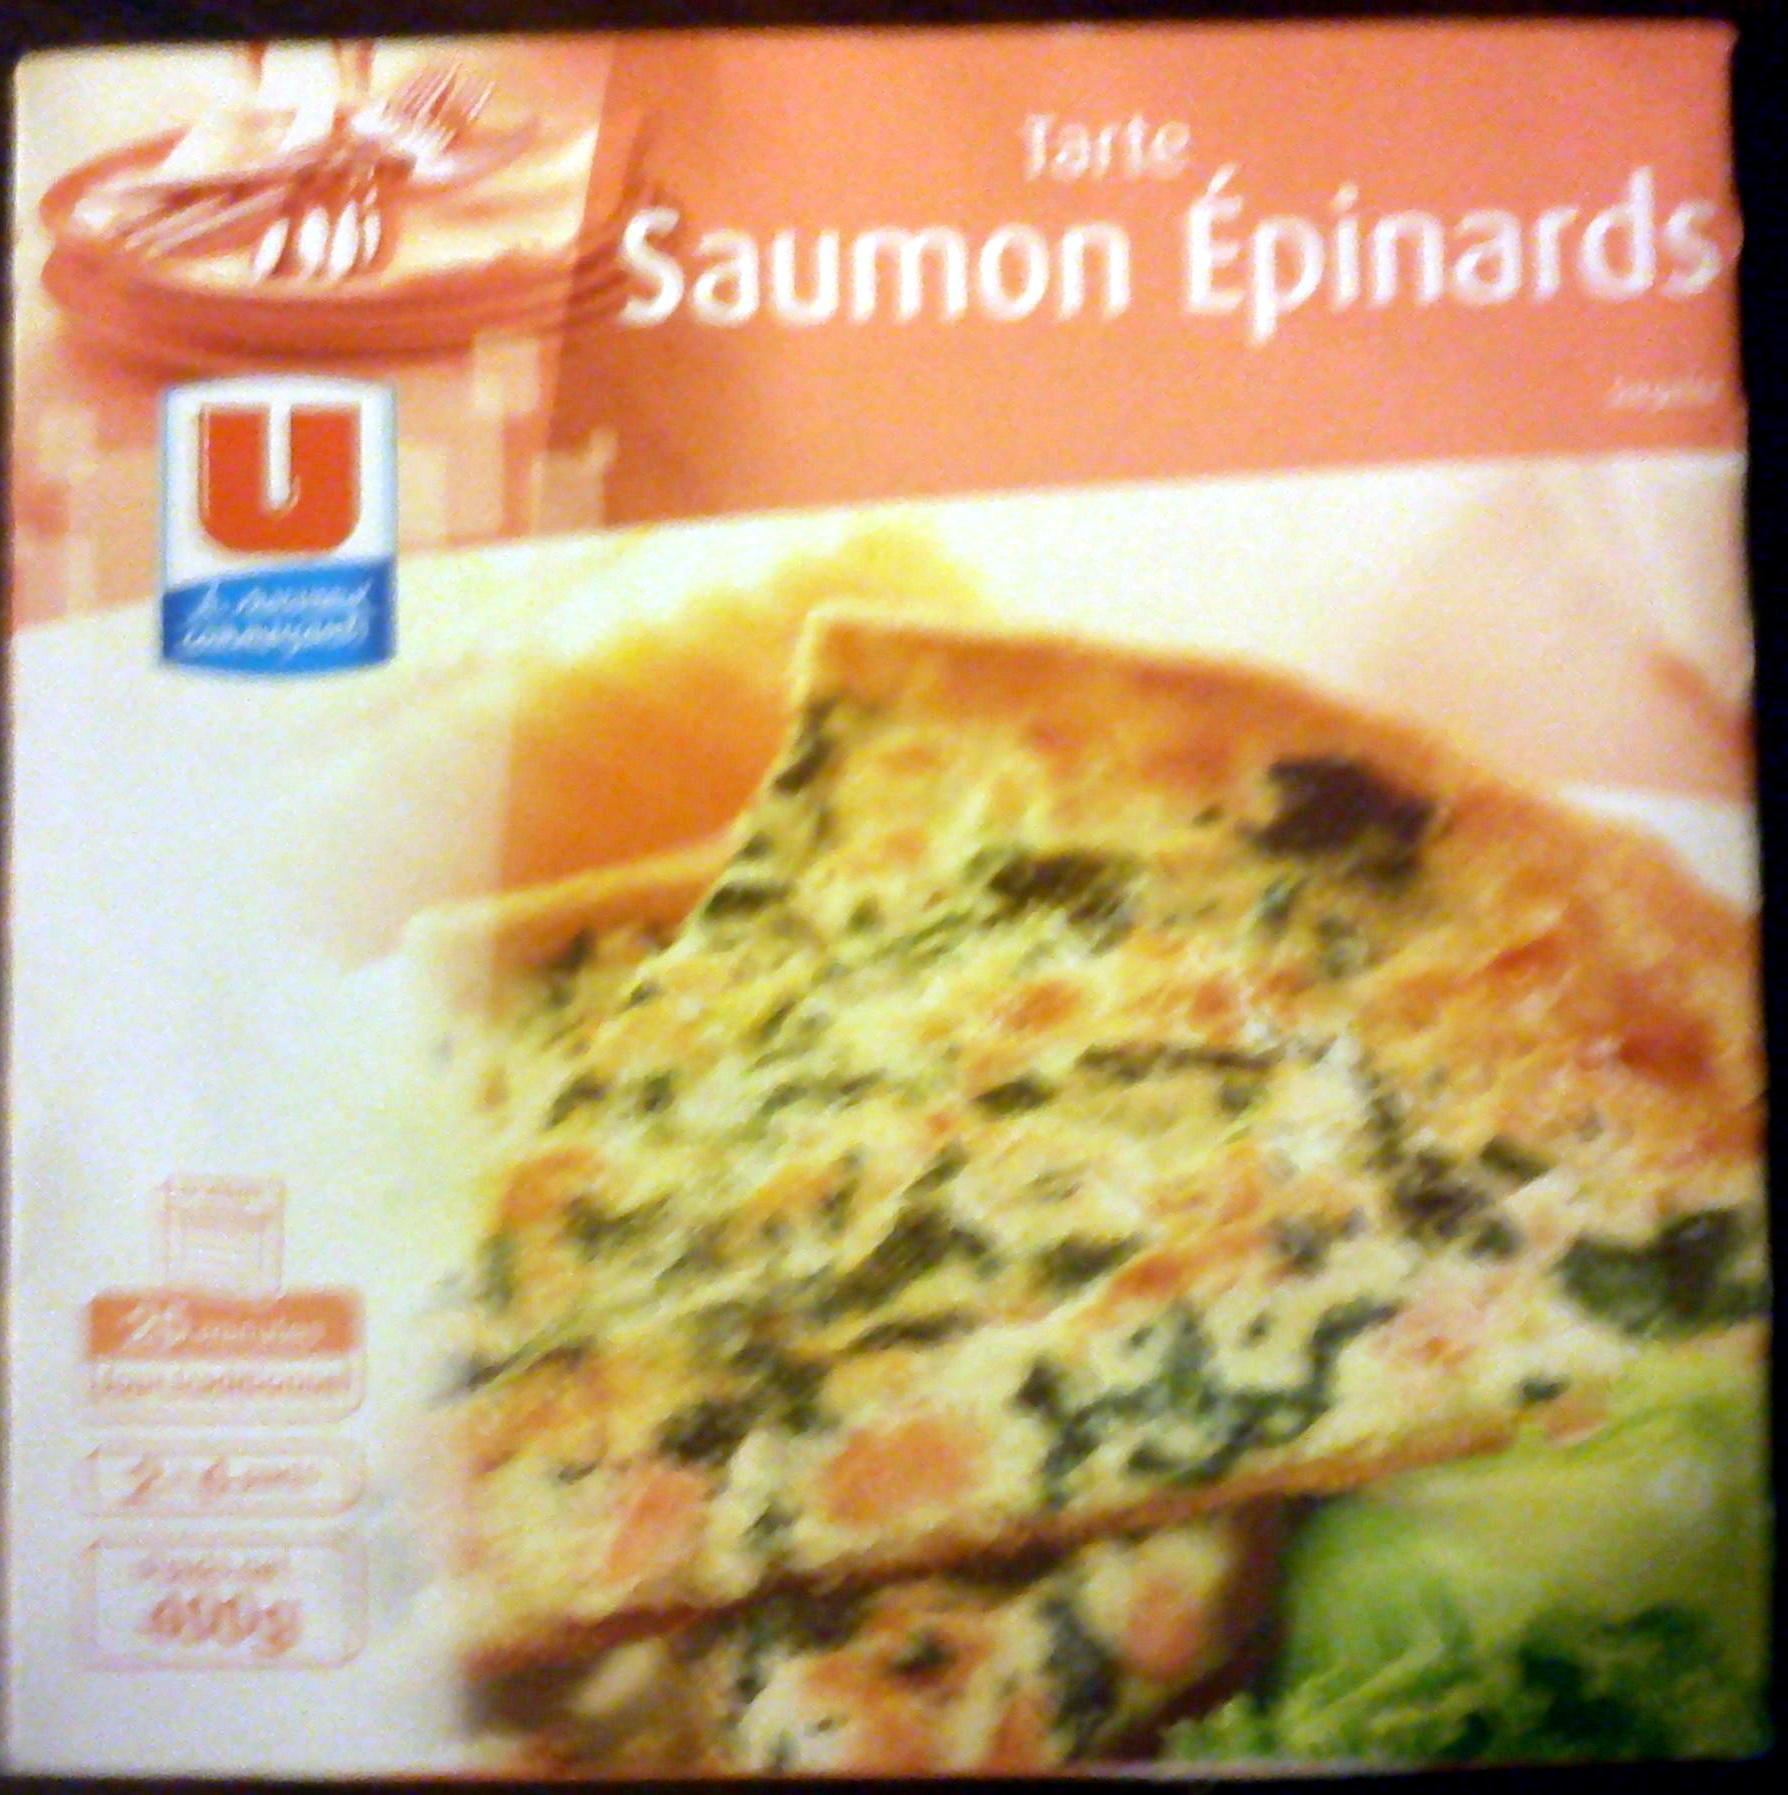 Tarte saumon épinards - Product